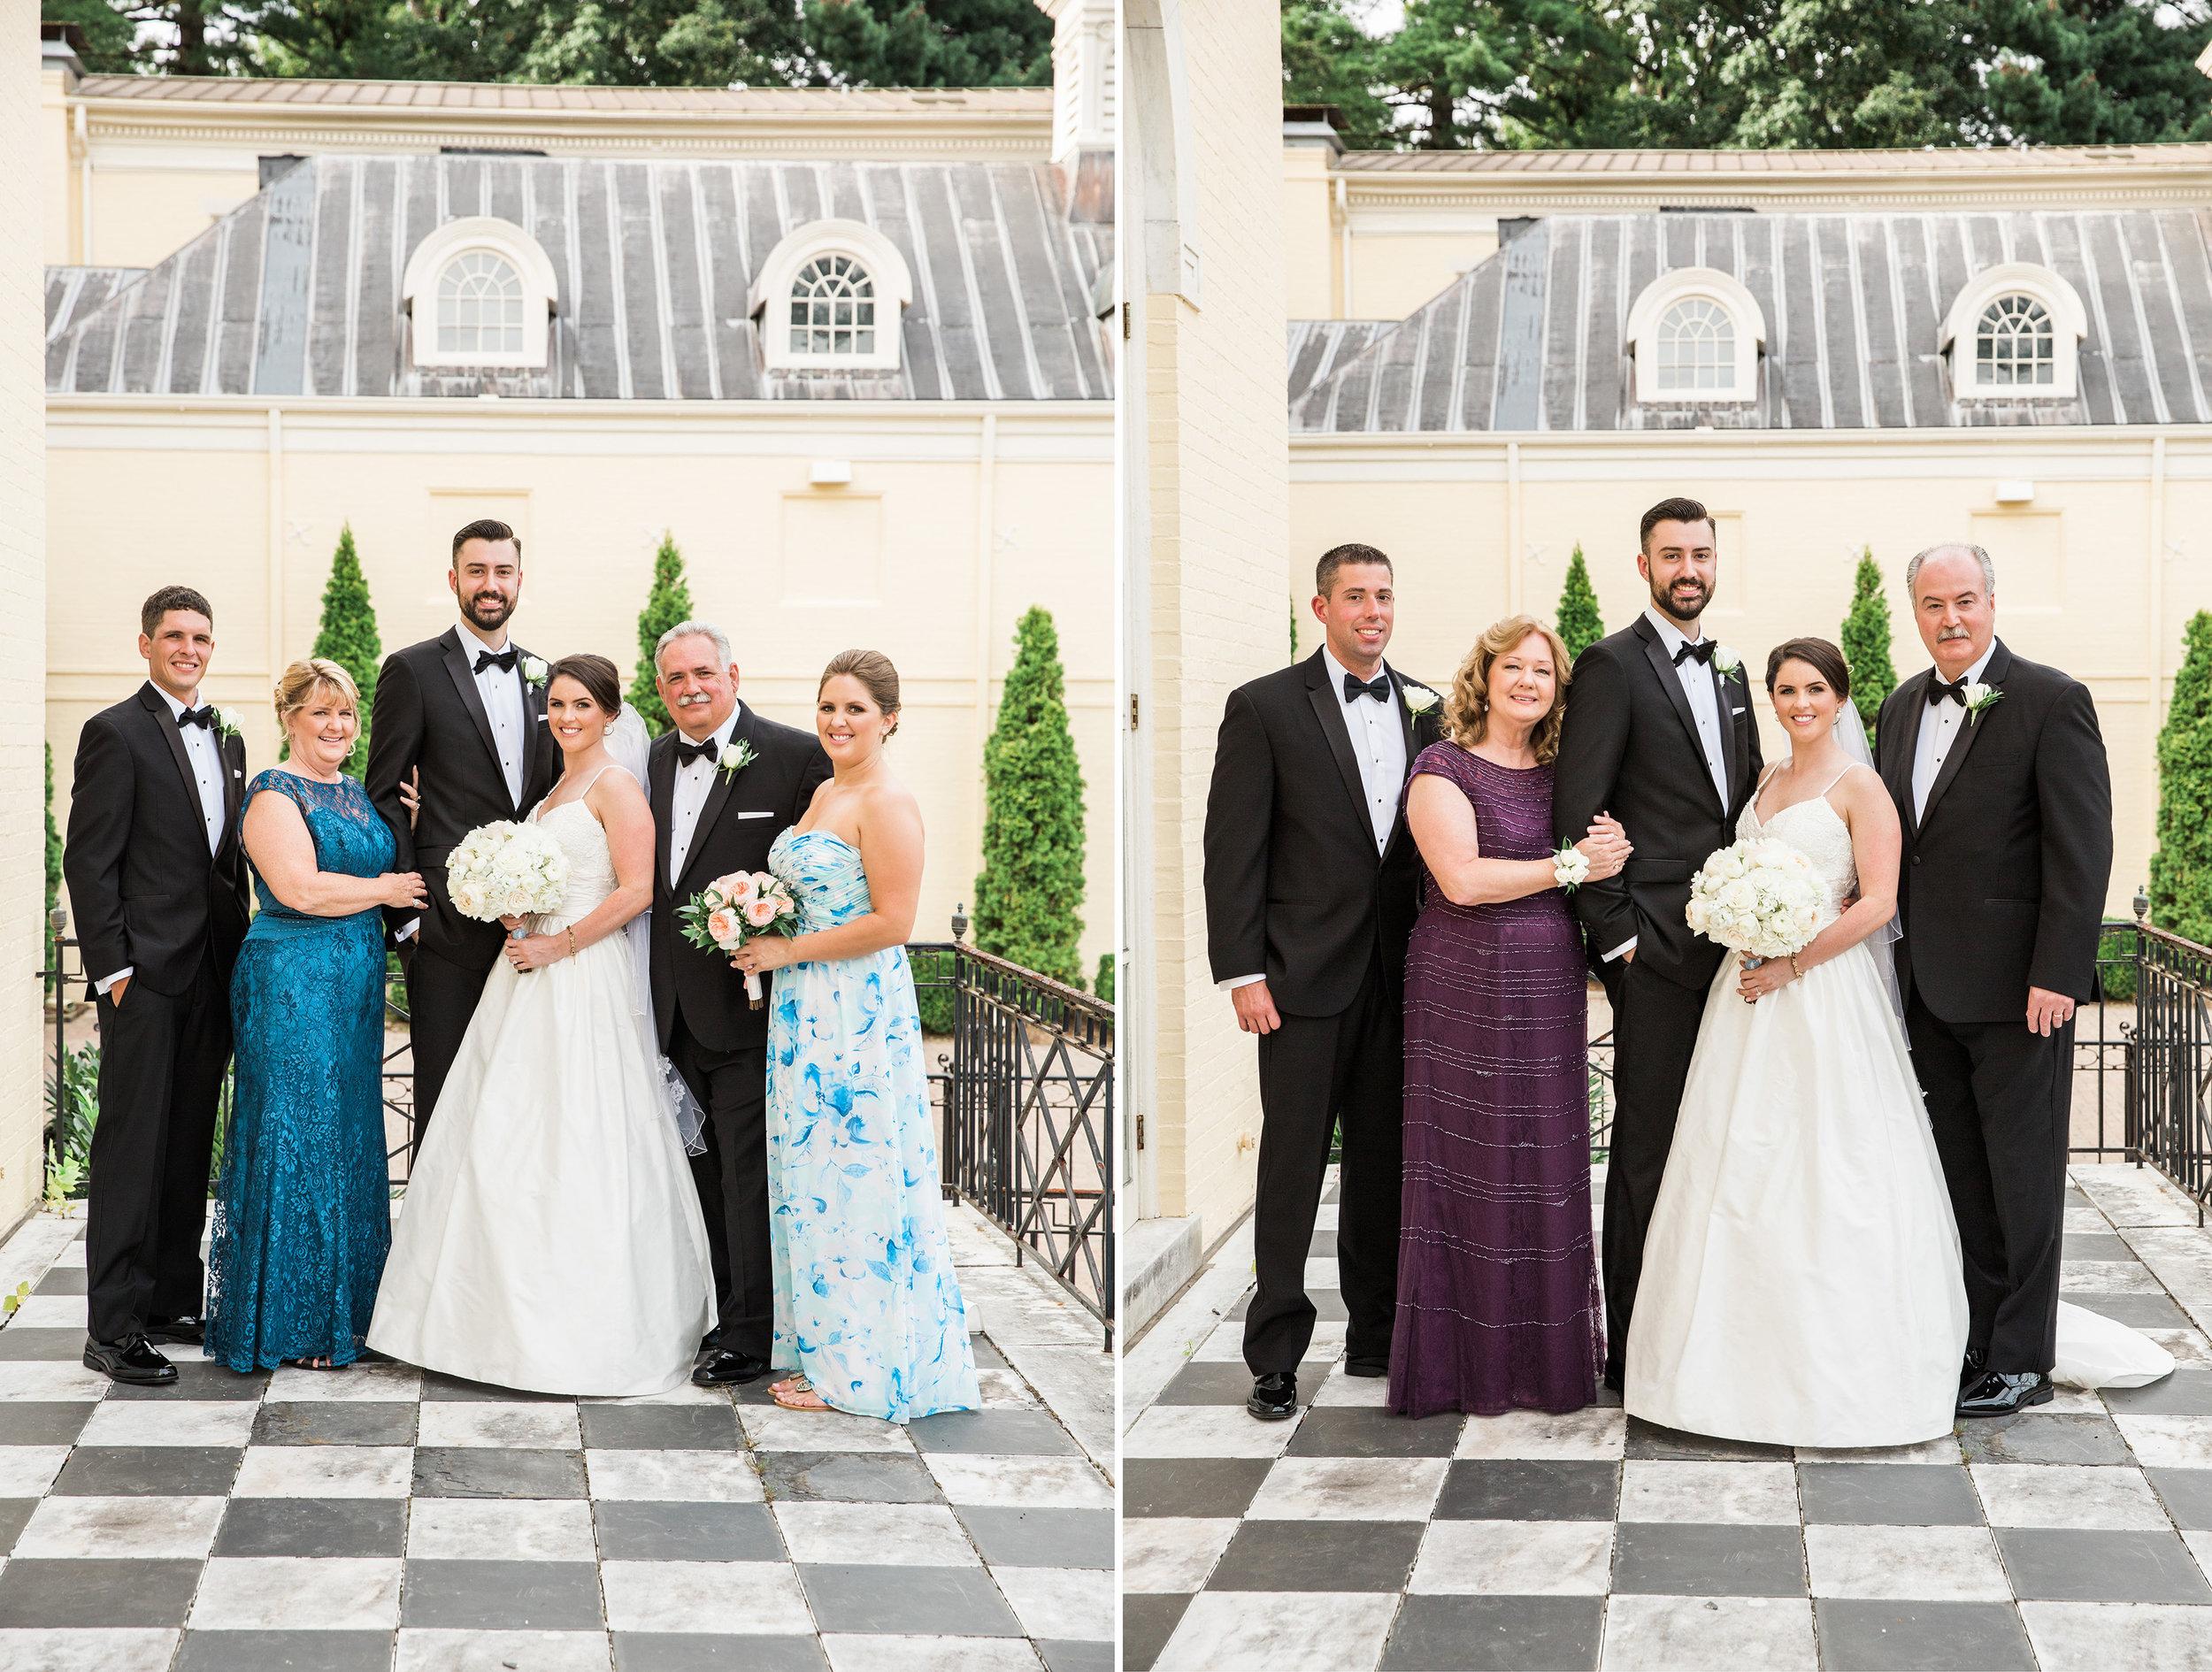 Evergreen-Museum-Balitmore-Maryland-Wedding-Black-Tie-Bride-020.jpg